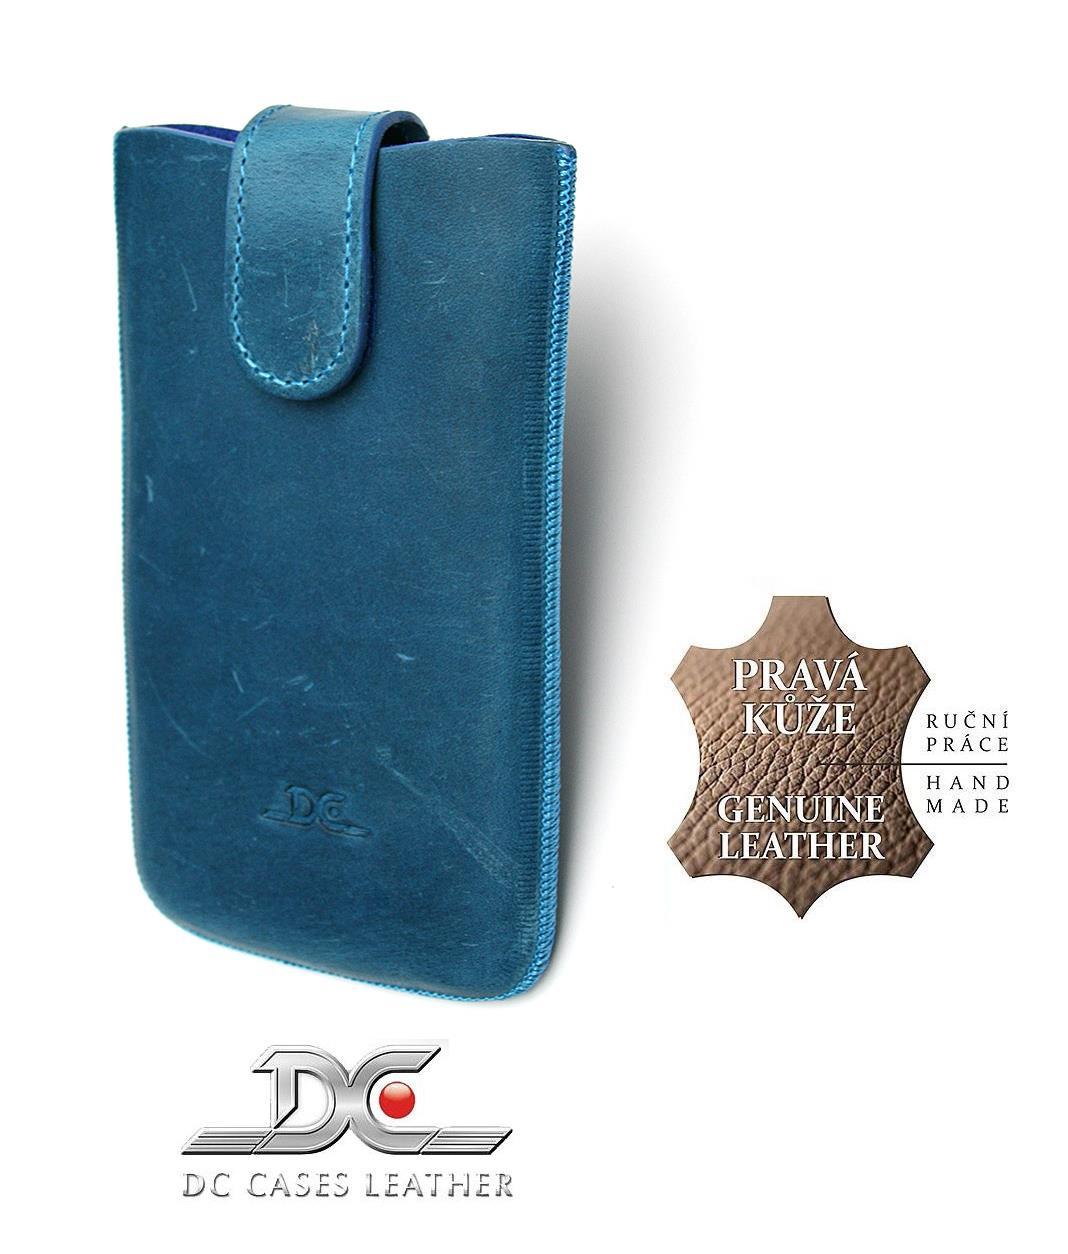 DC (TOP) POUZDRO L T26 Legacy Grezy MODRÉ  (N97, IPHONE 4G, HTC DESIRE ..)